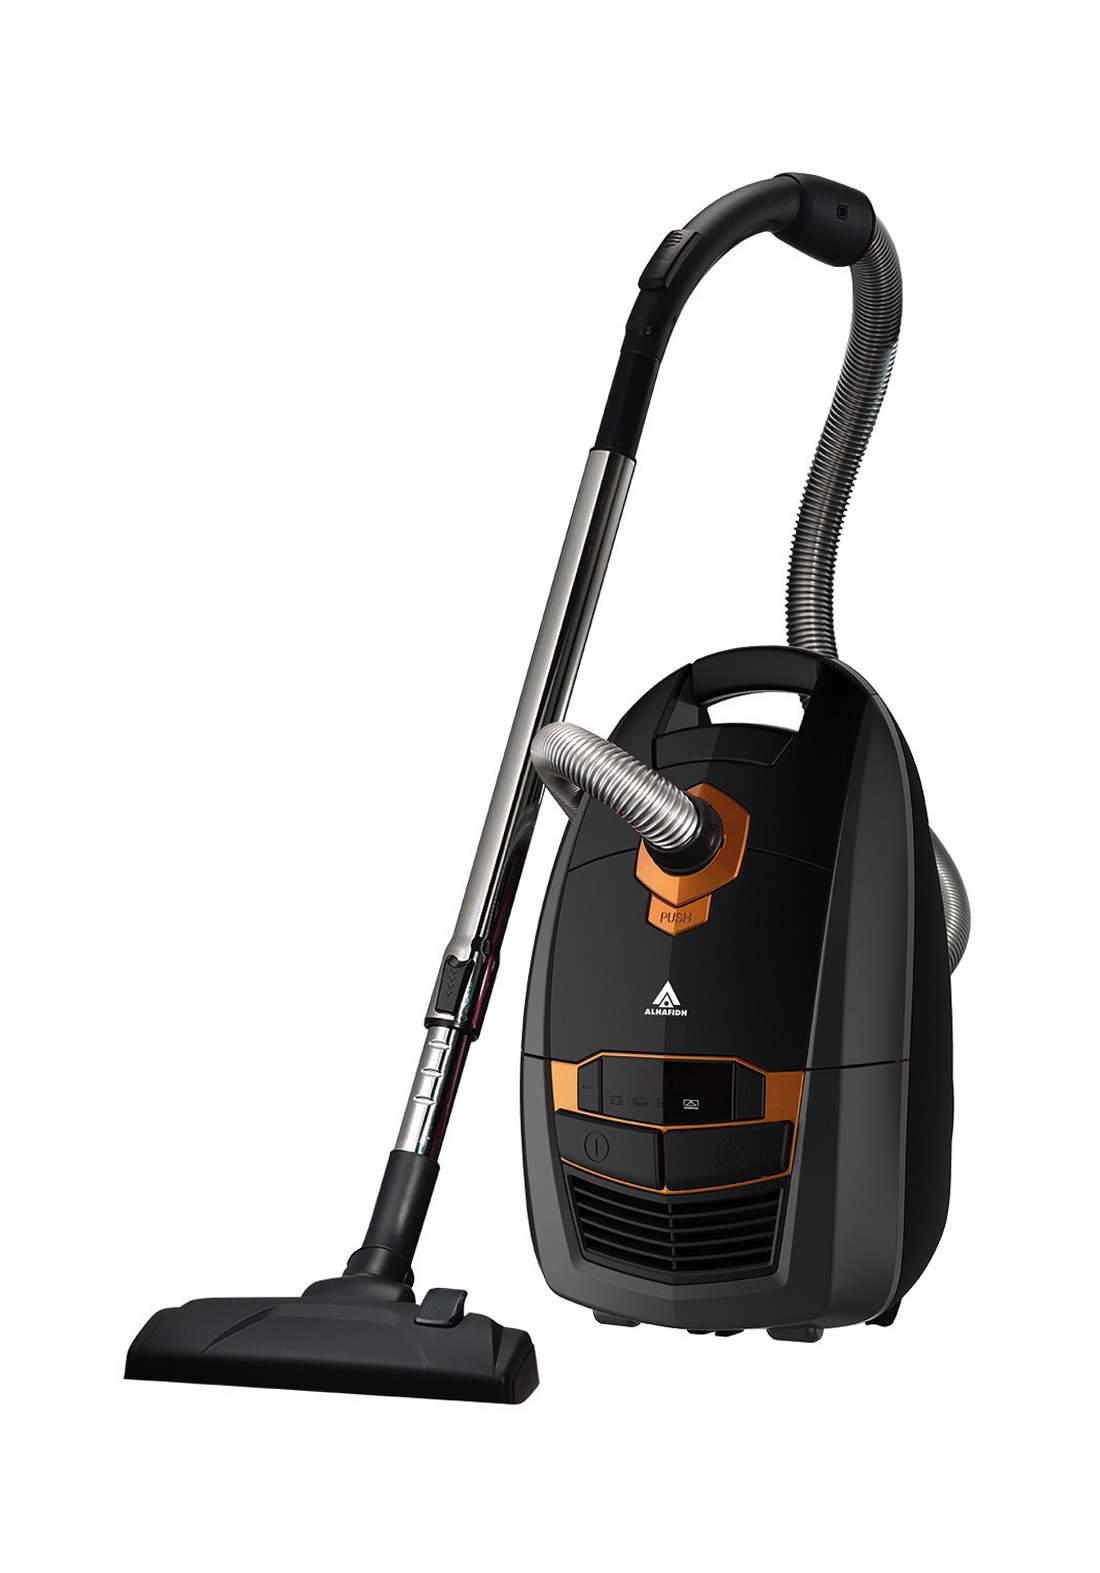 Alhafidh VCHA-2200CB66 Bagged Canister Vacuum Cleaner 6L 2200W مكنسة